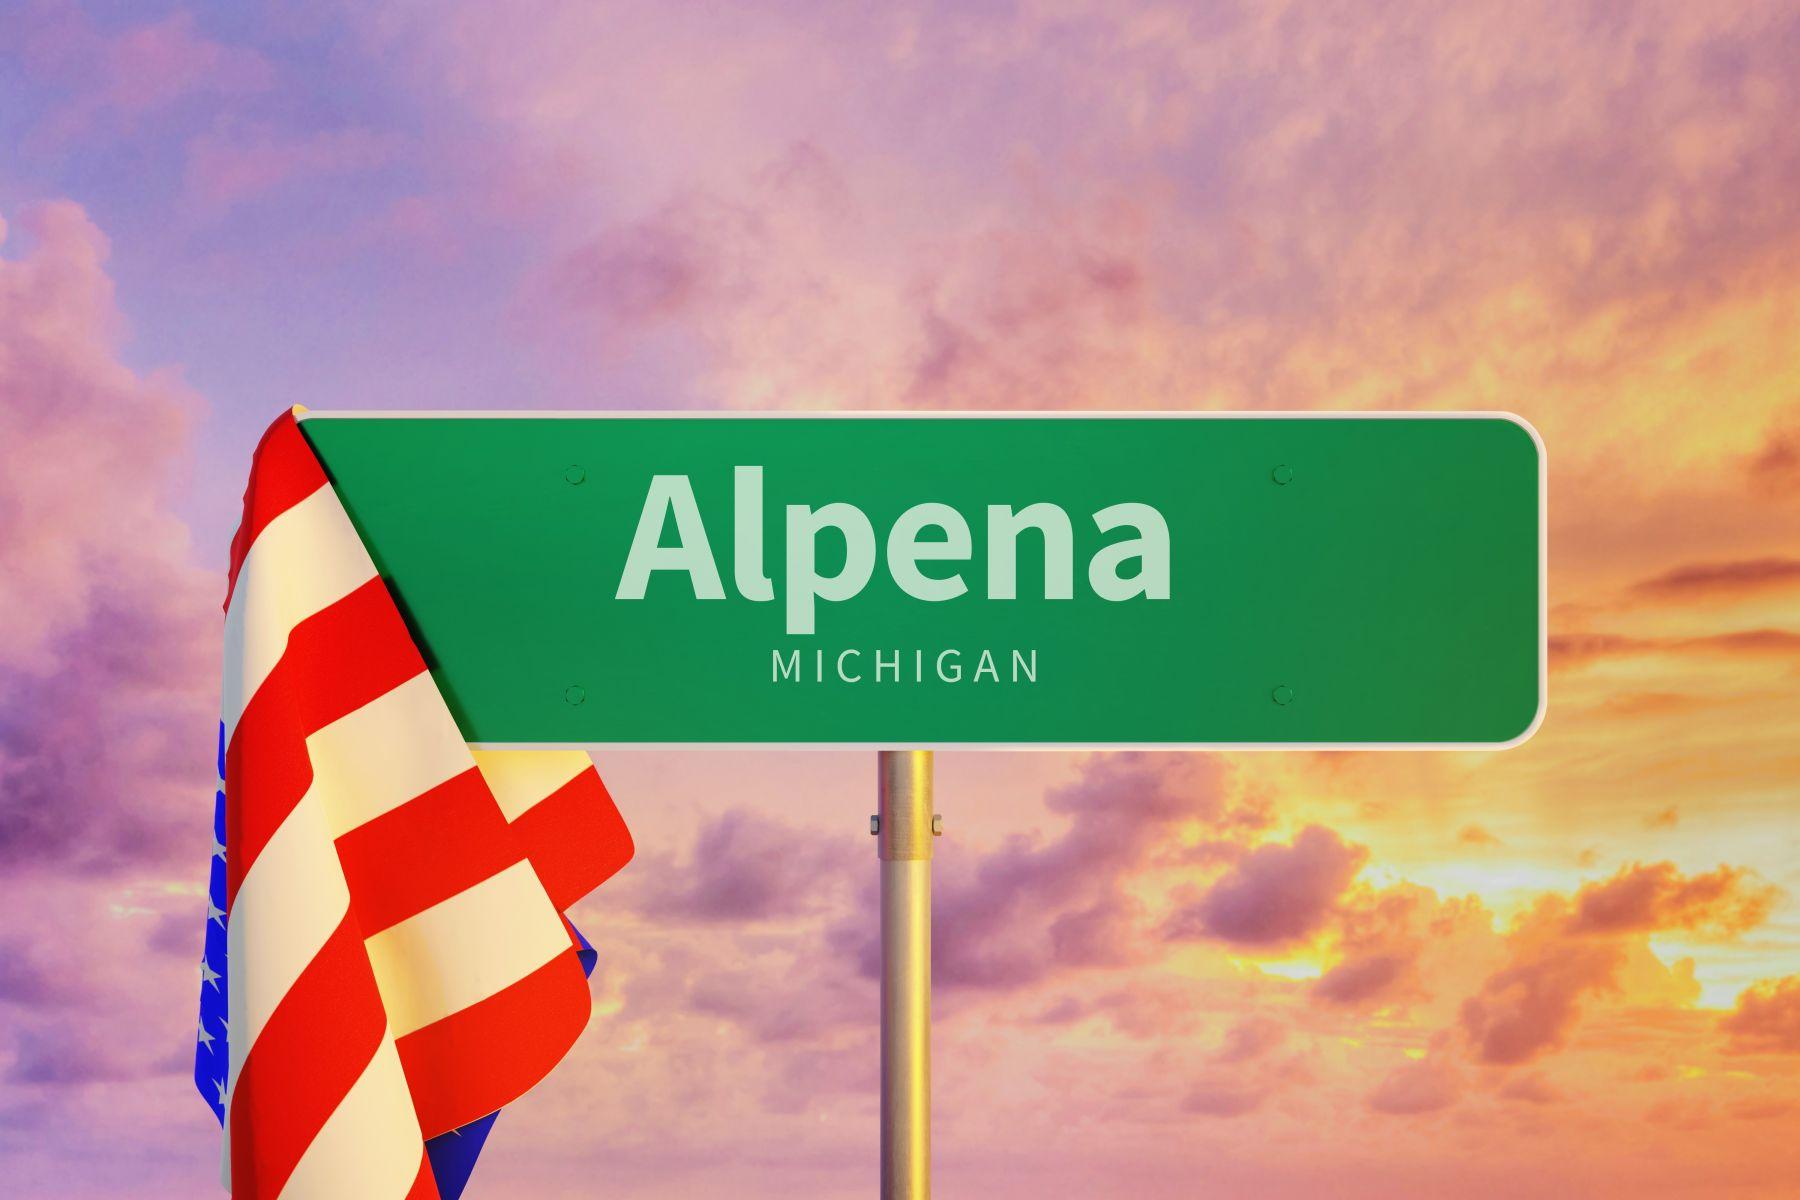 Alpena